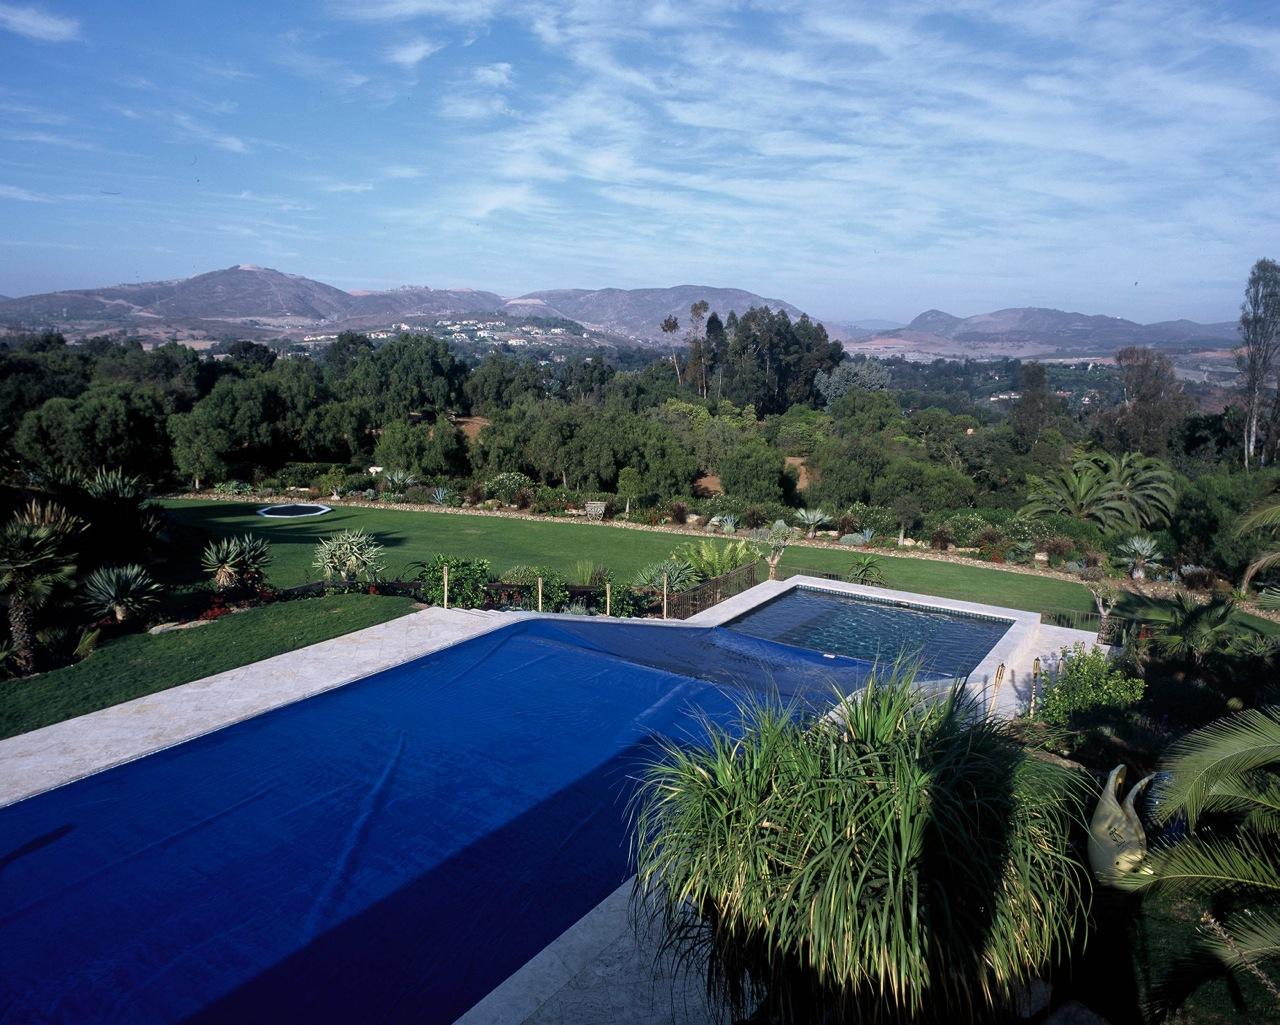 Slide Pool in San Diego, USA